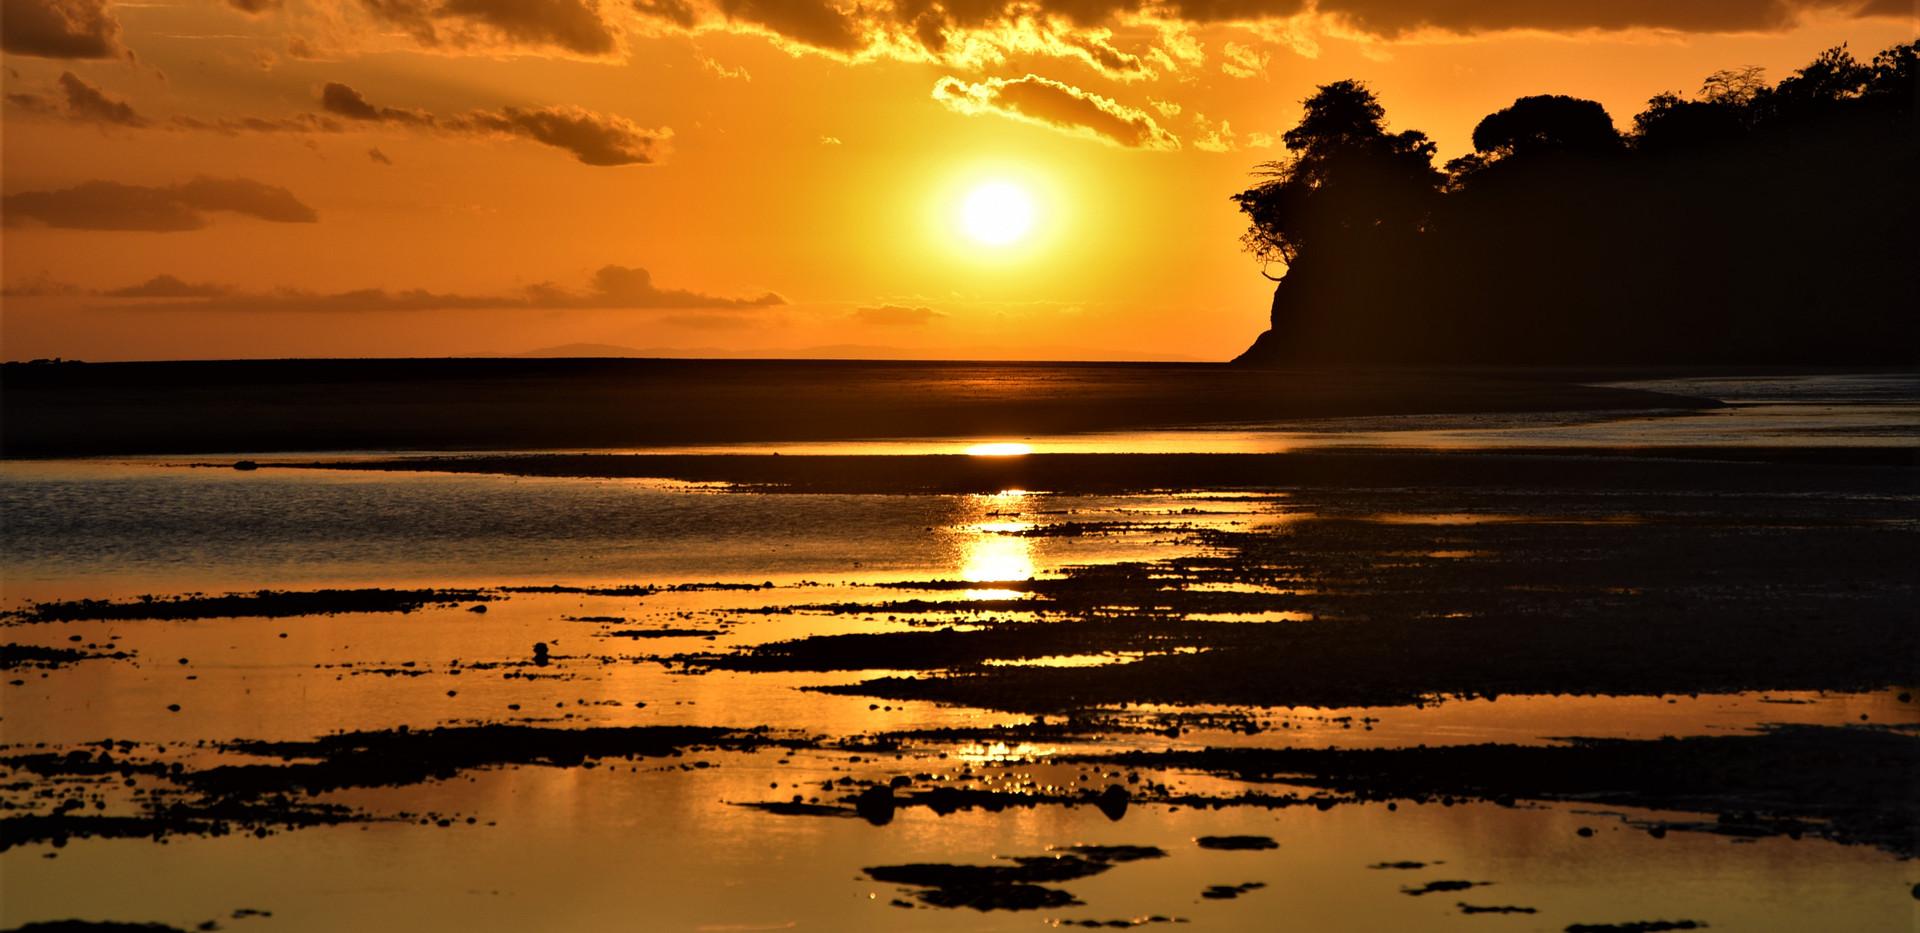 Soleil couchant Santa Catalina - Panama